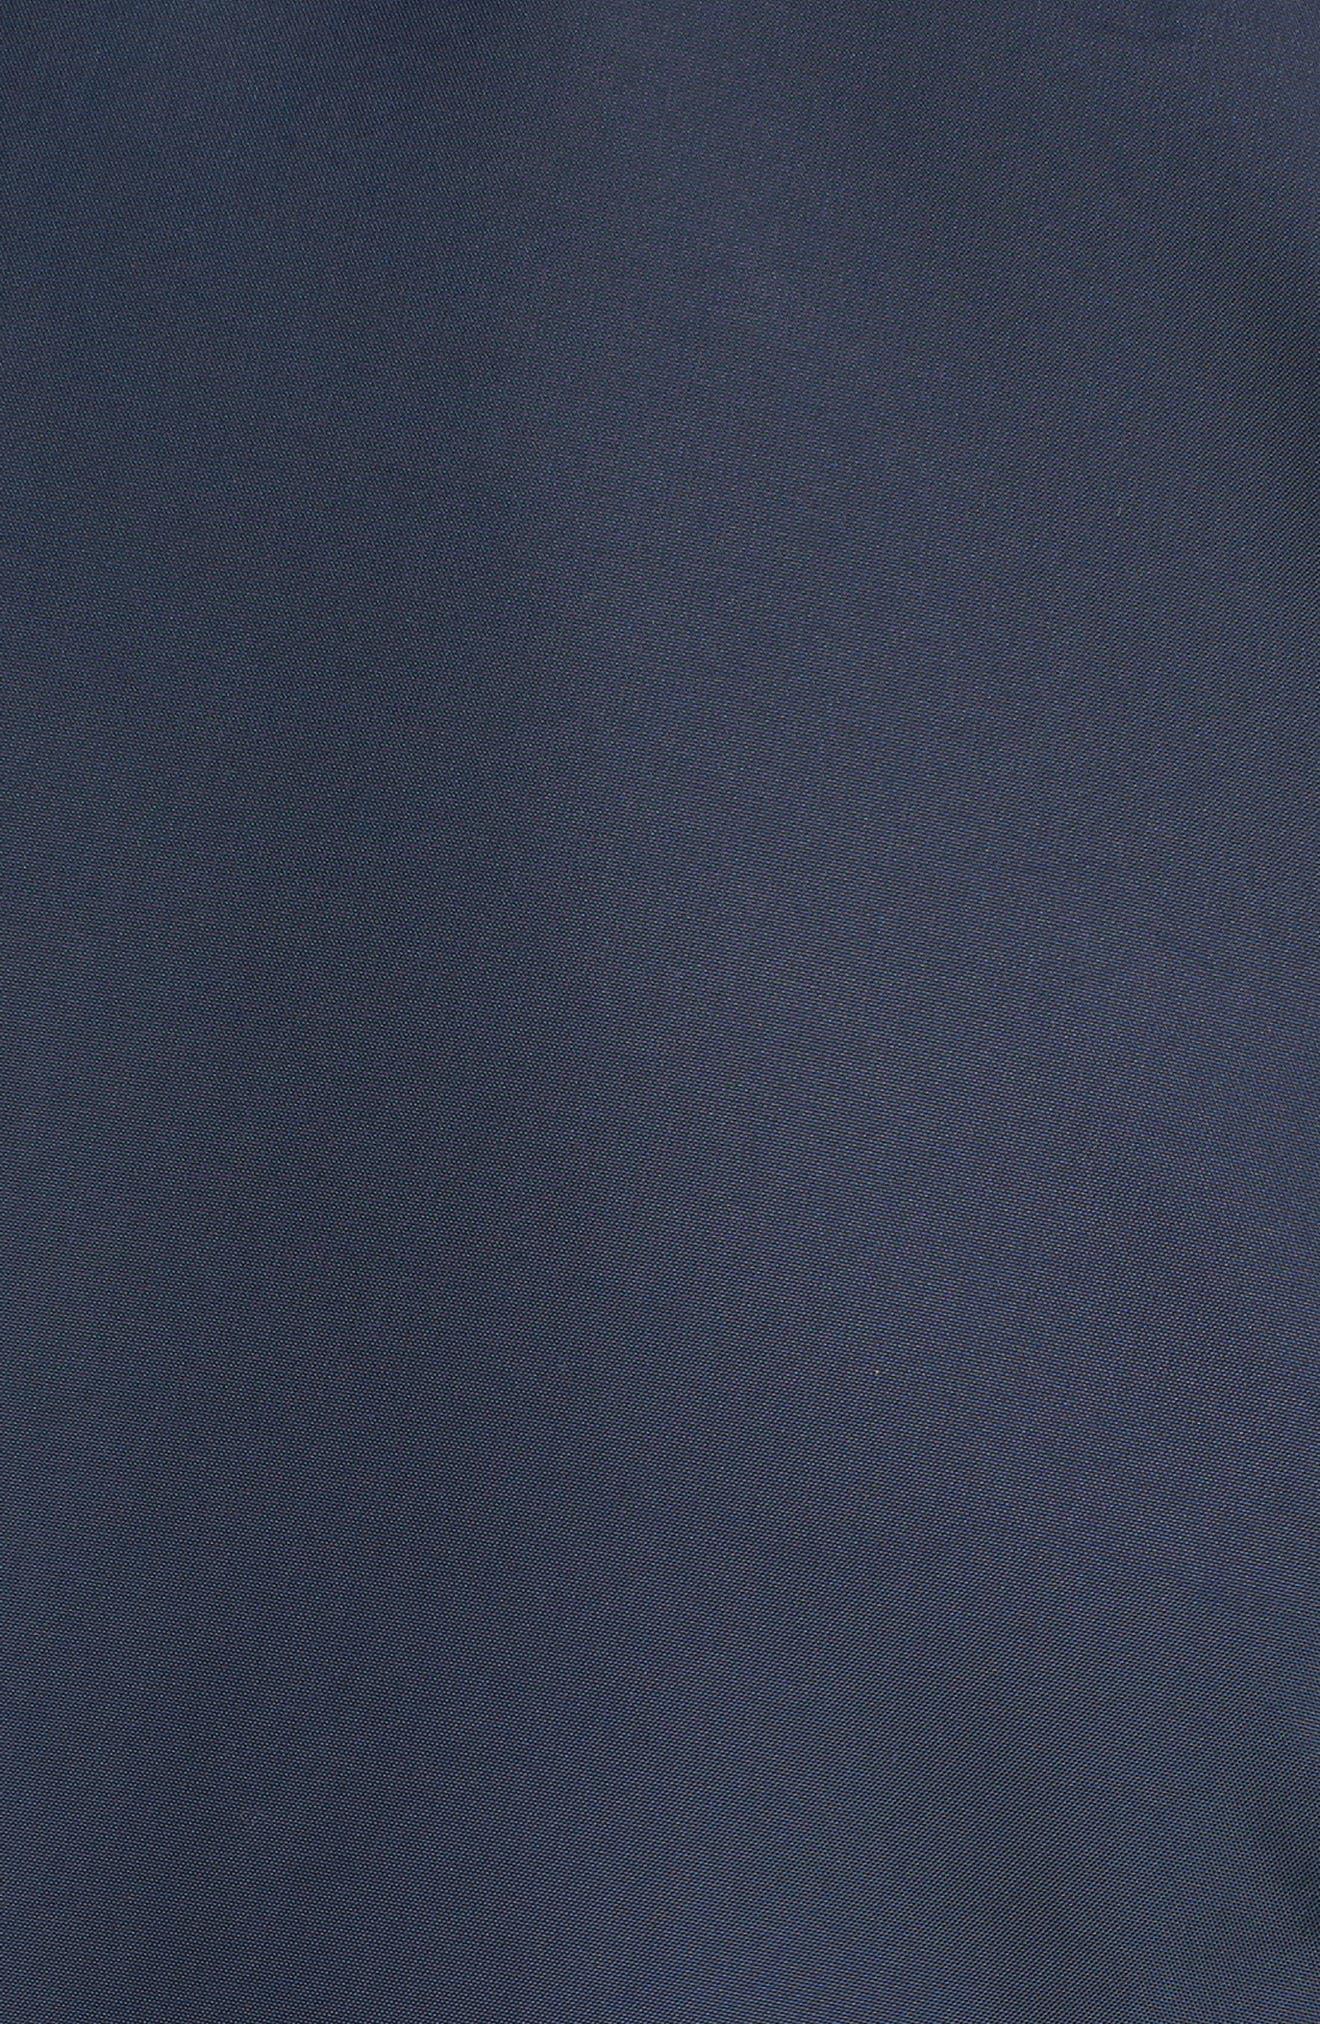 Shield Core Zip Golf Jacket,                             Alternate thumbnail 7, color,                             OBSIDIAN/ OBSIDIAN/ BLACK